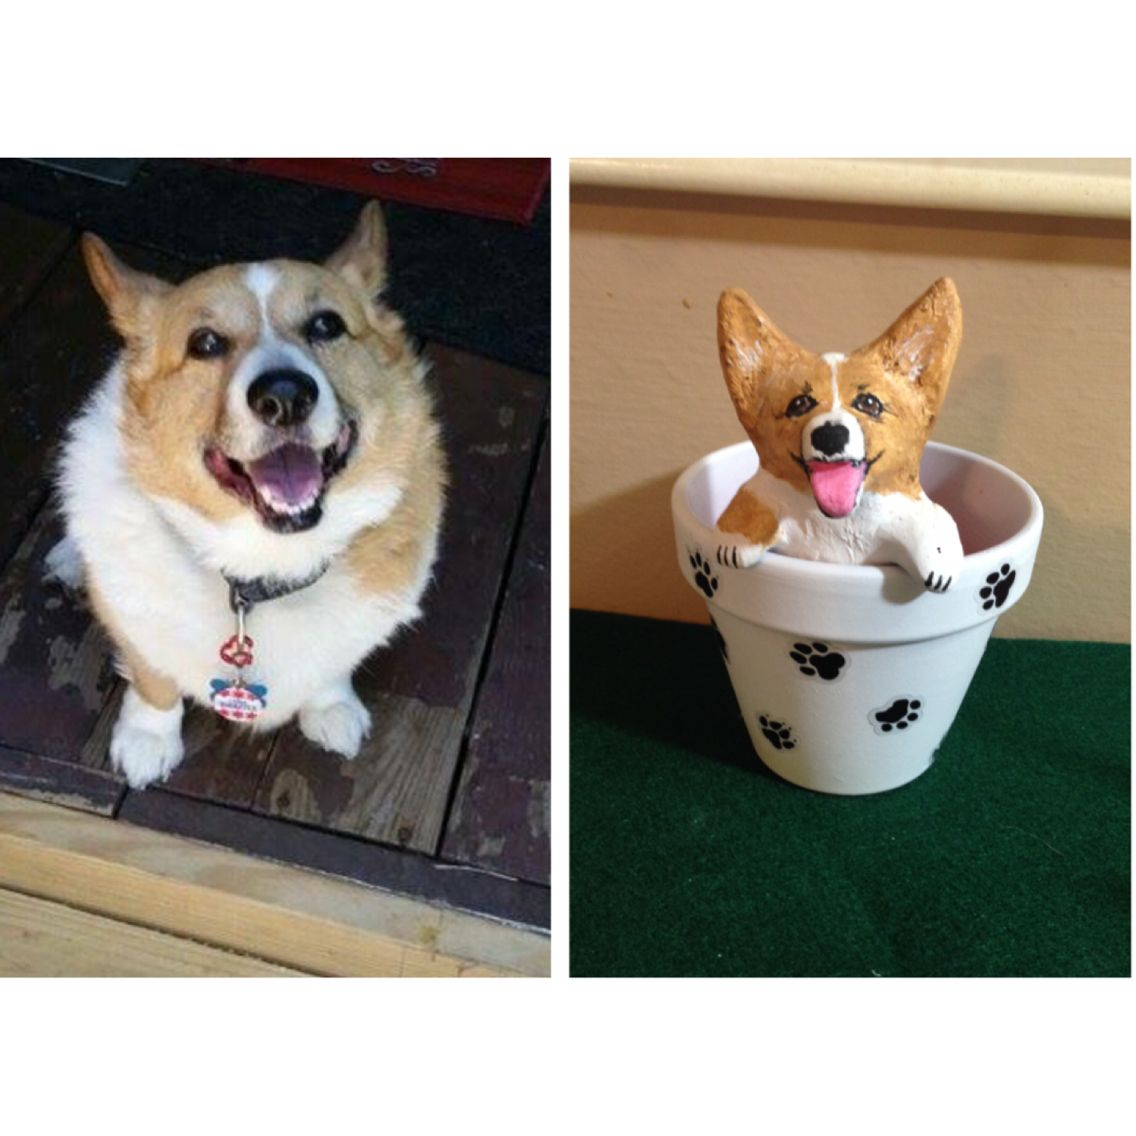 Tucker & his minime! PuppyinaPot Puppies